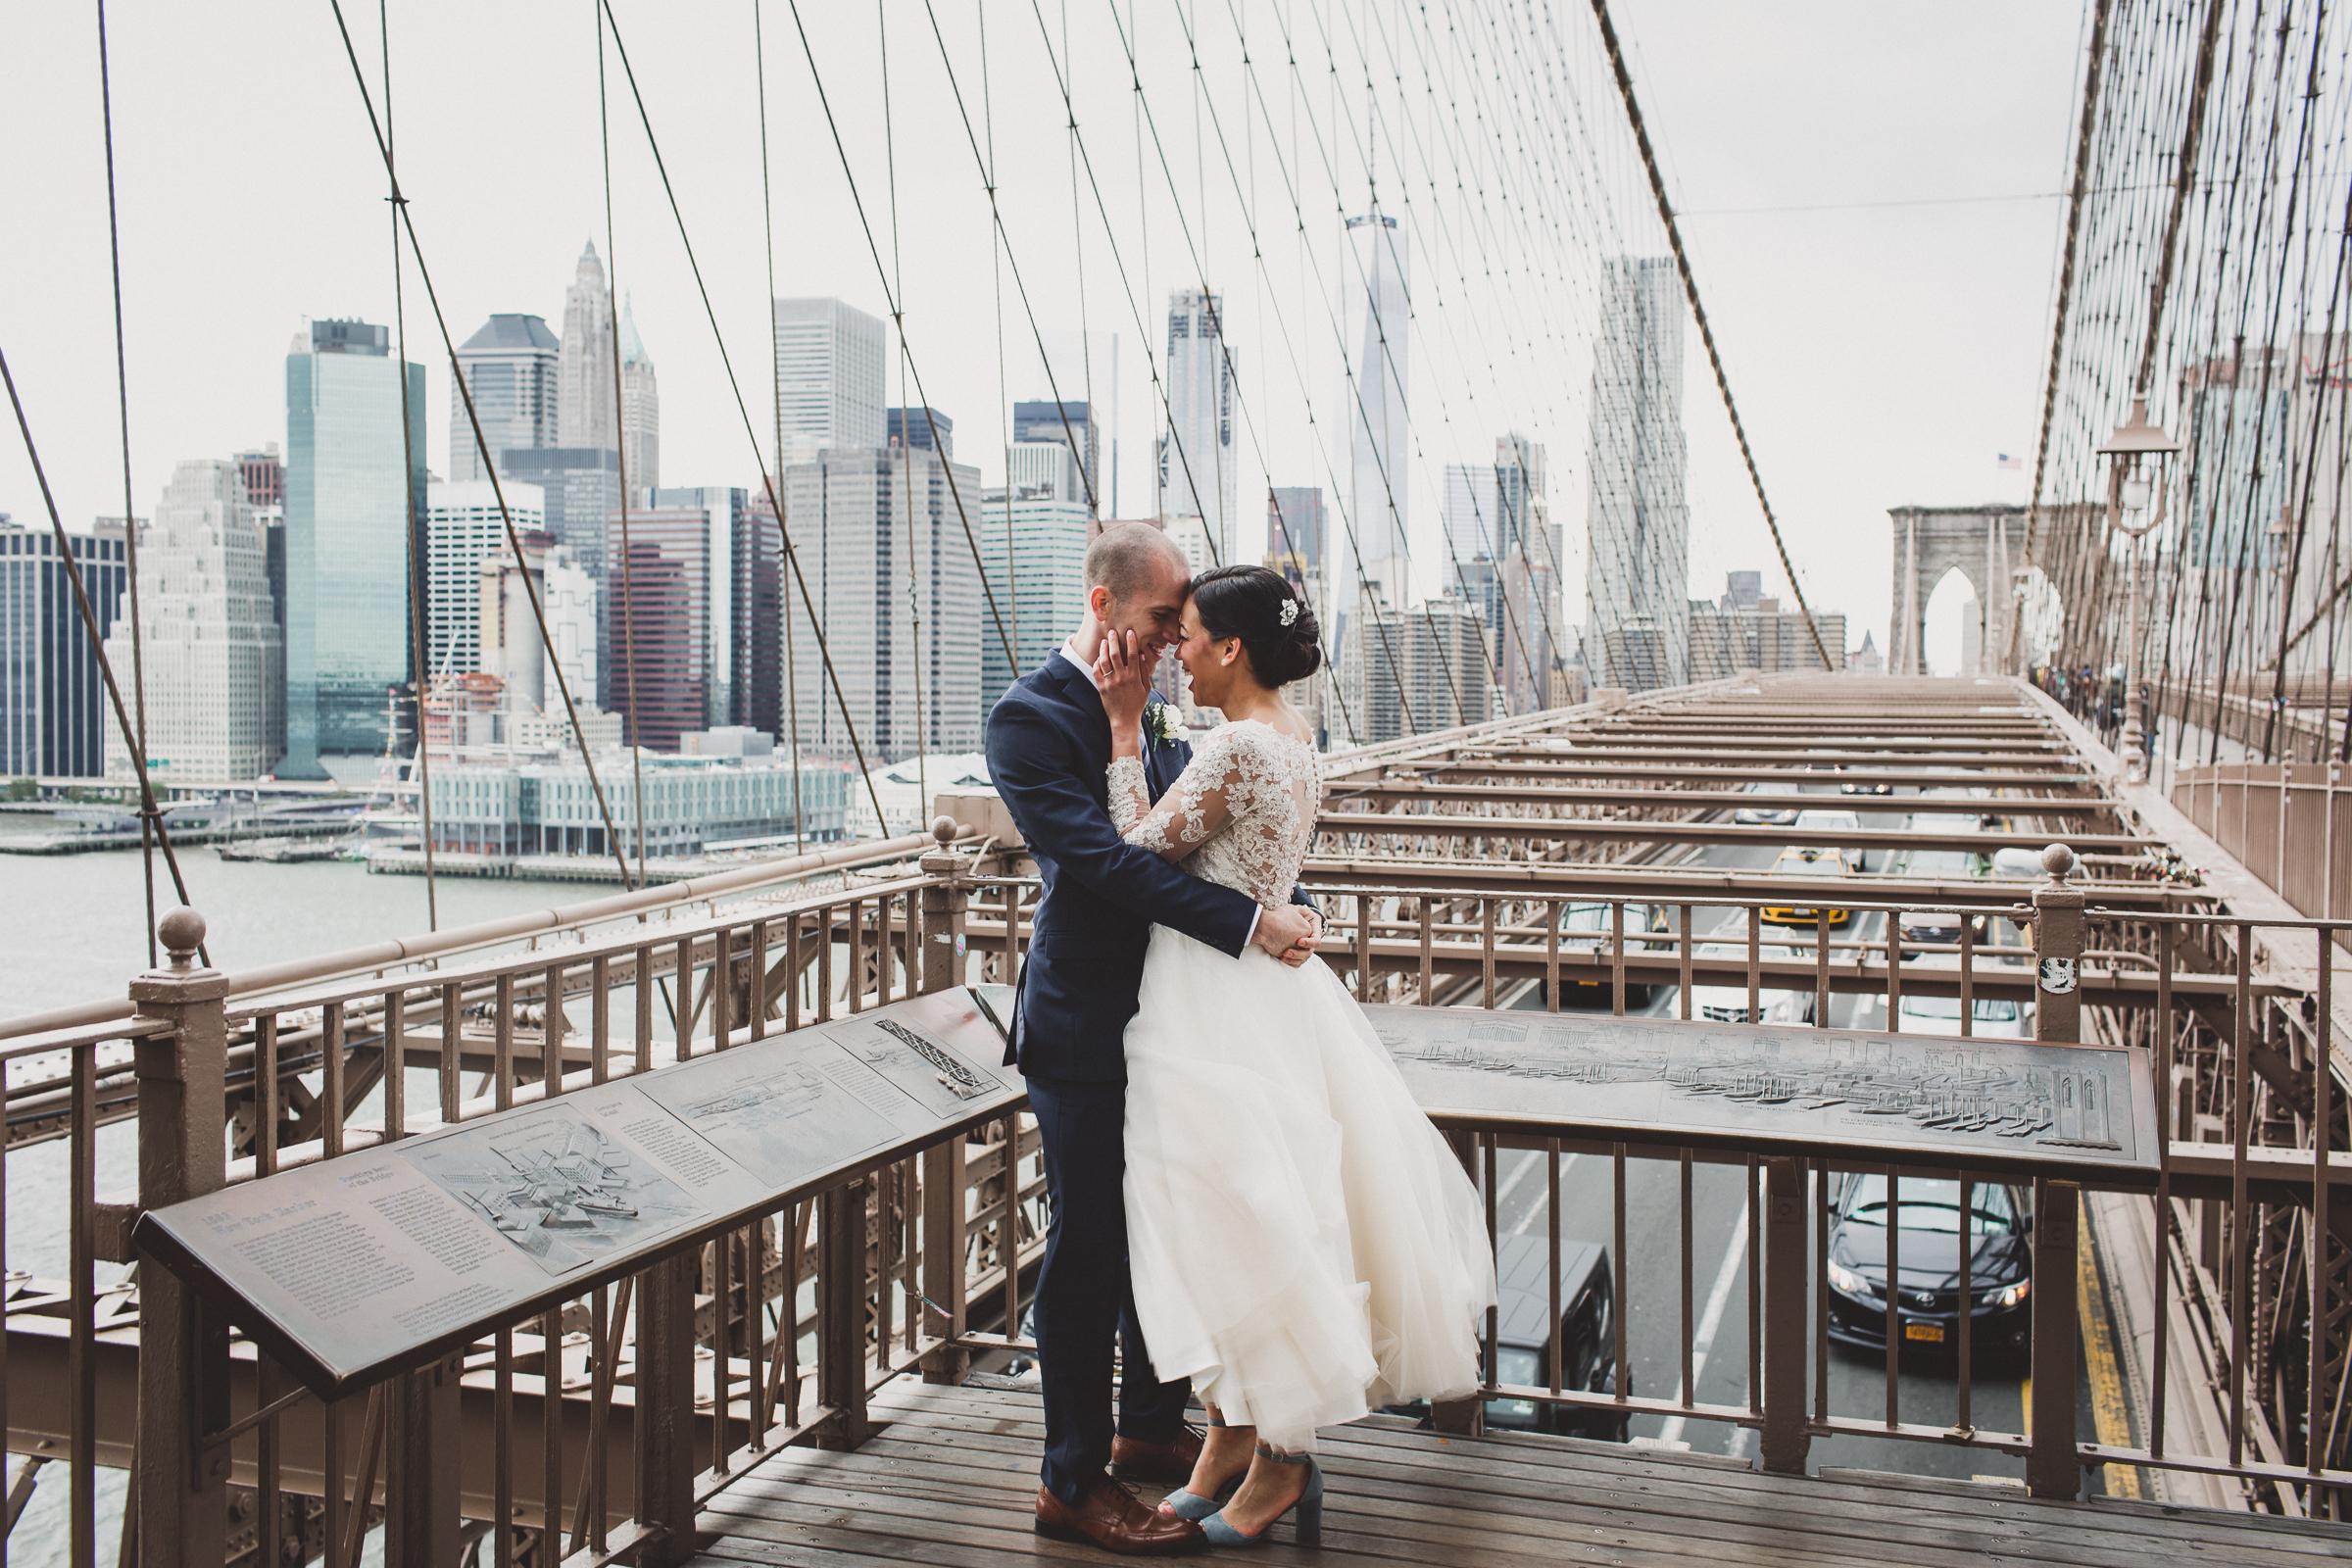 New-York-Documentary-Wedding-Photography-Best-Of-2017-by-Elvira-Kalviste-Photography-53.jpg